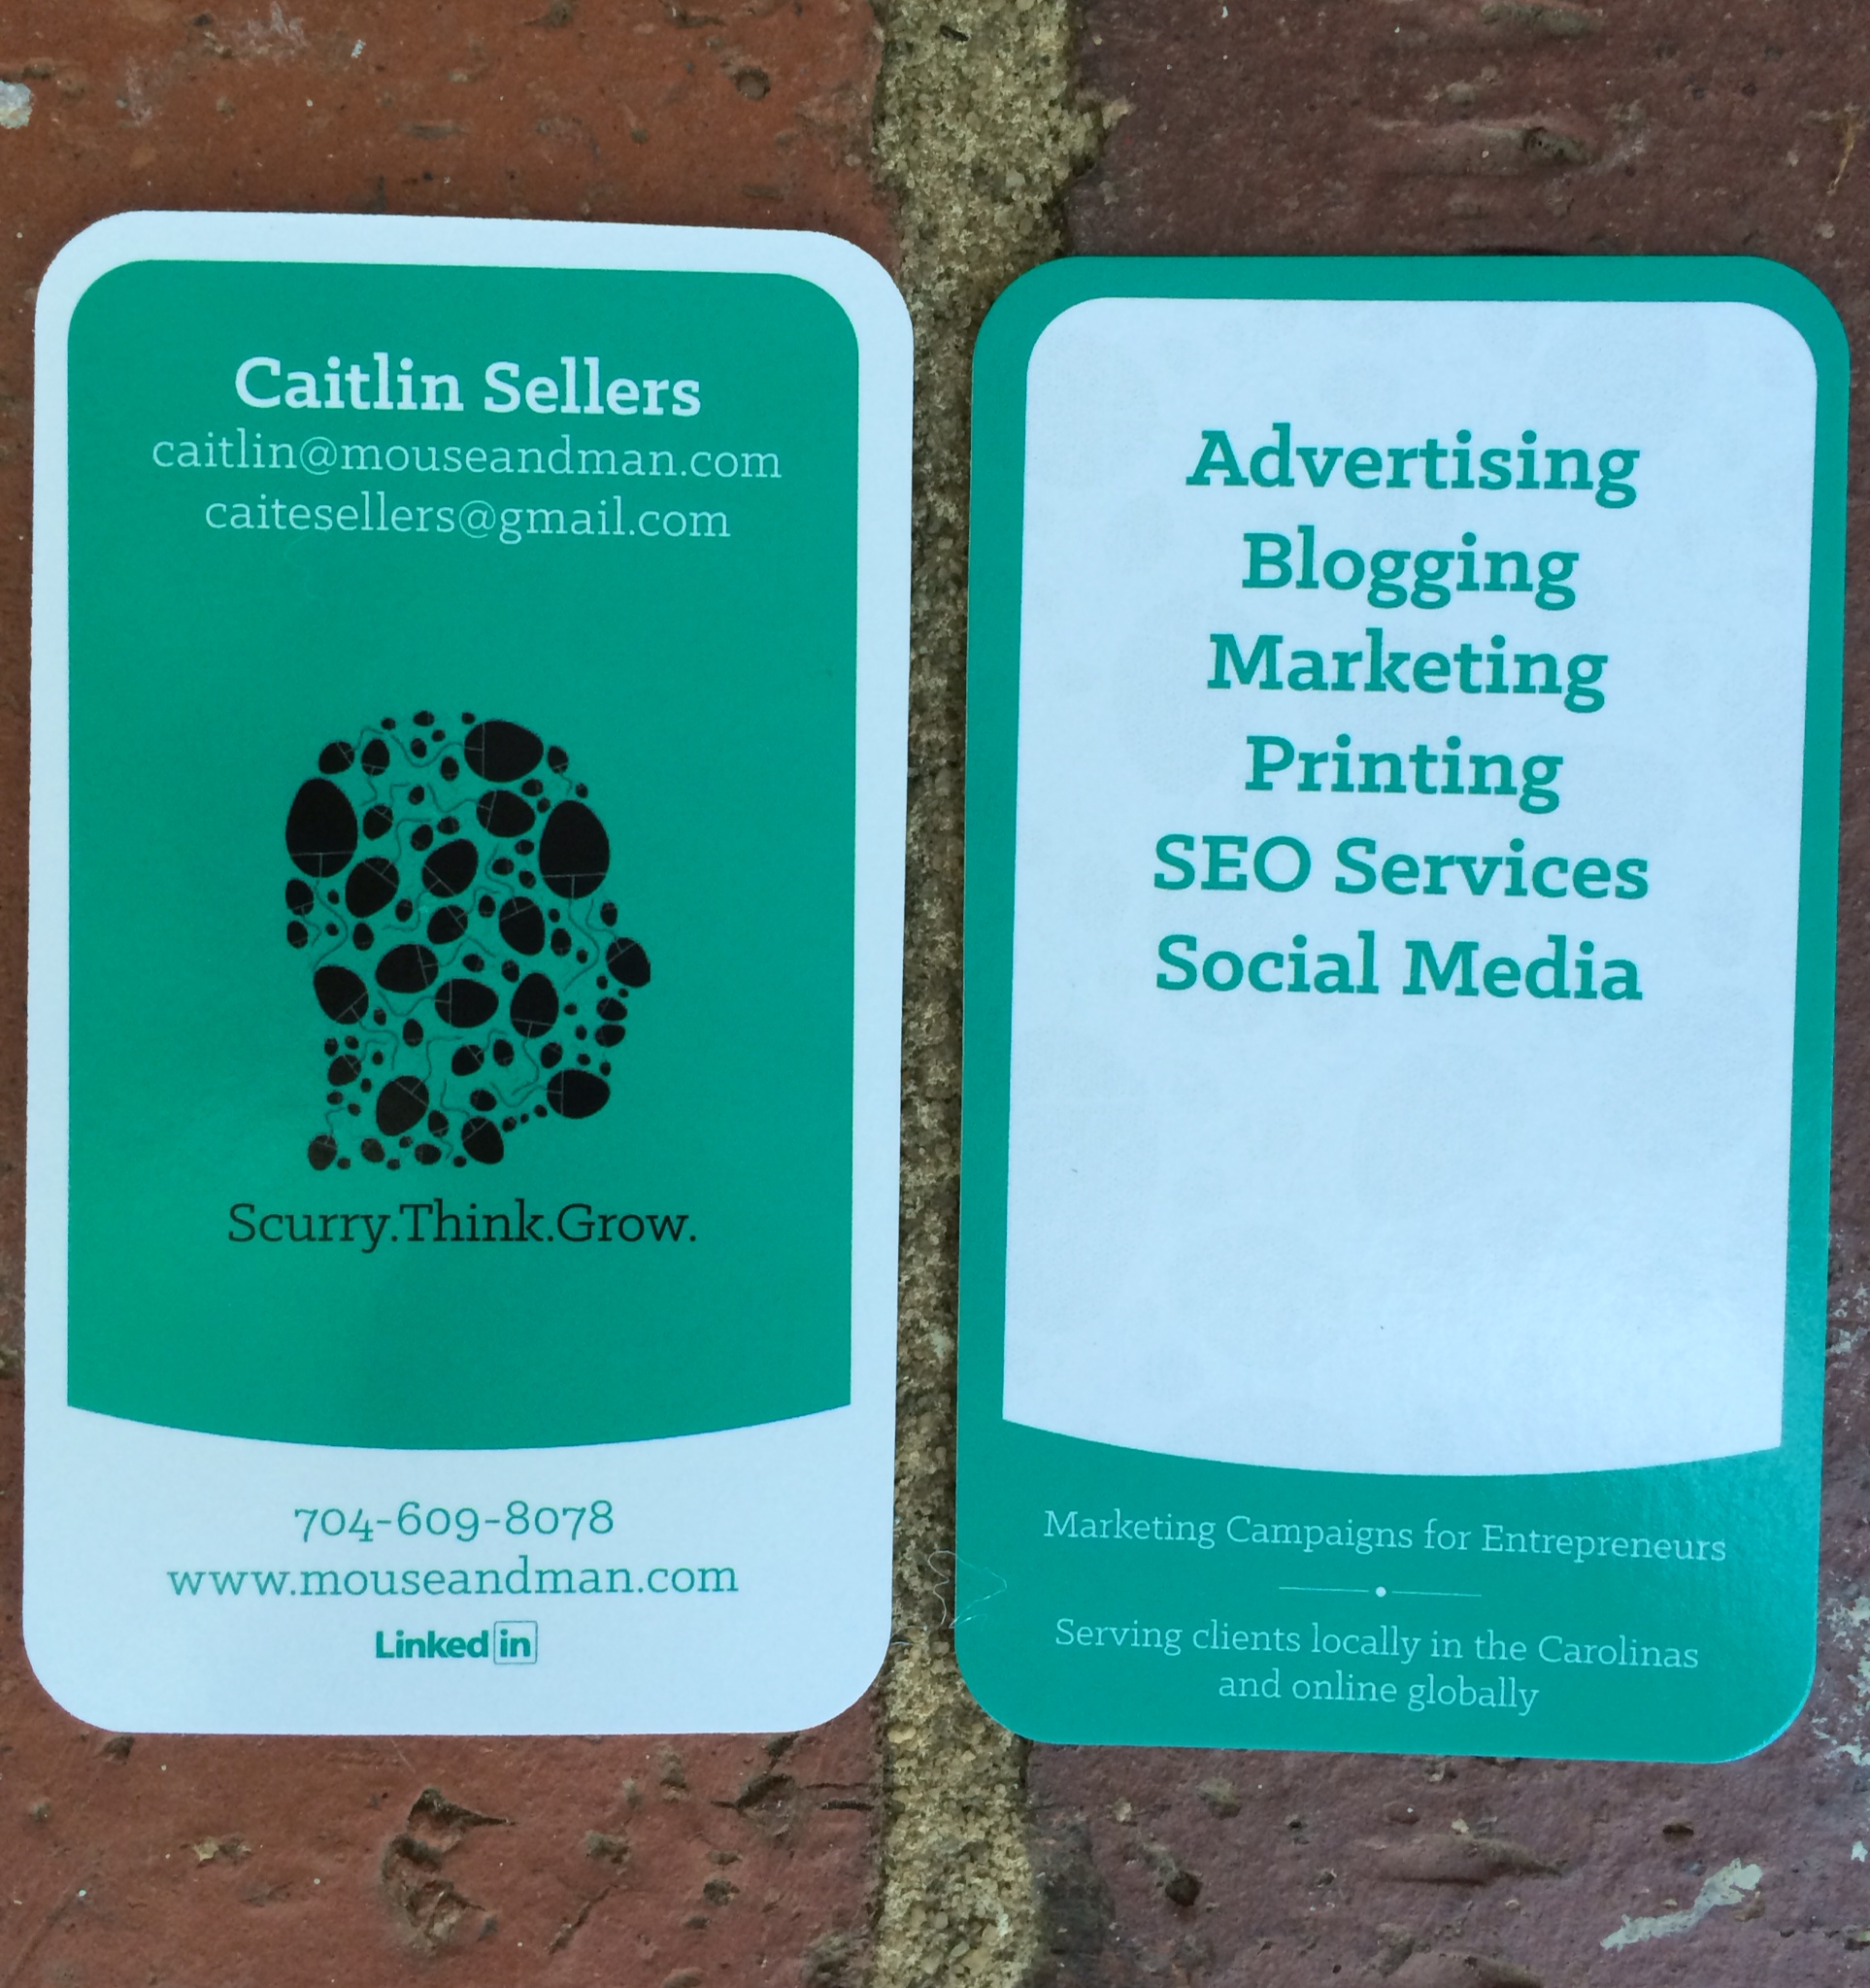 Caitlin Sellers Business Card